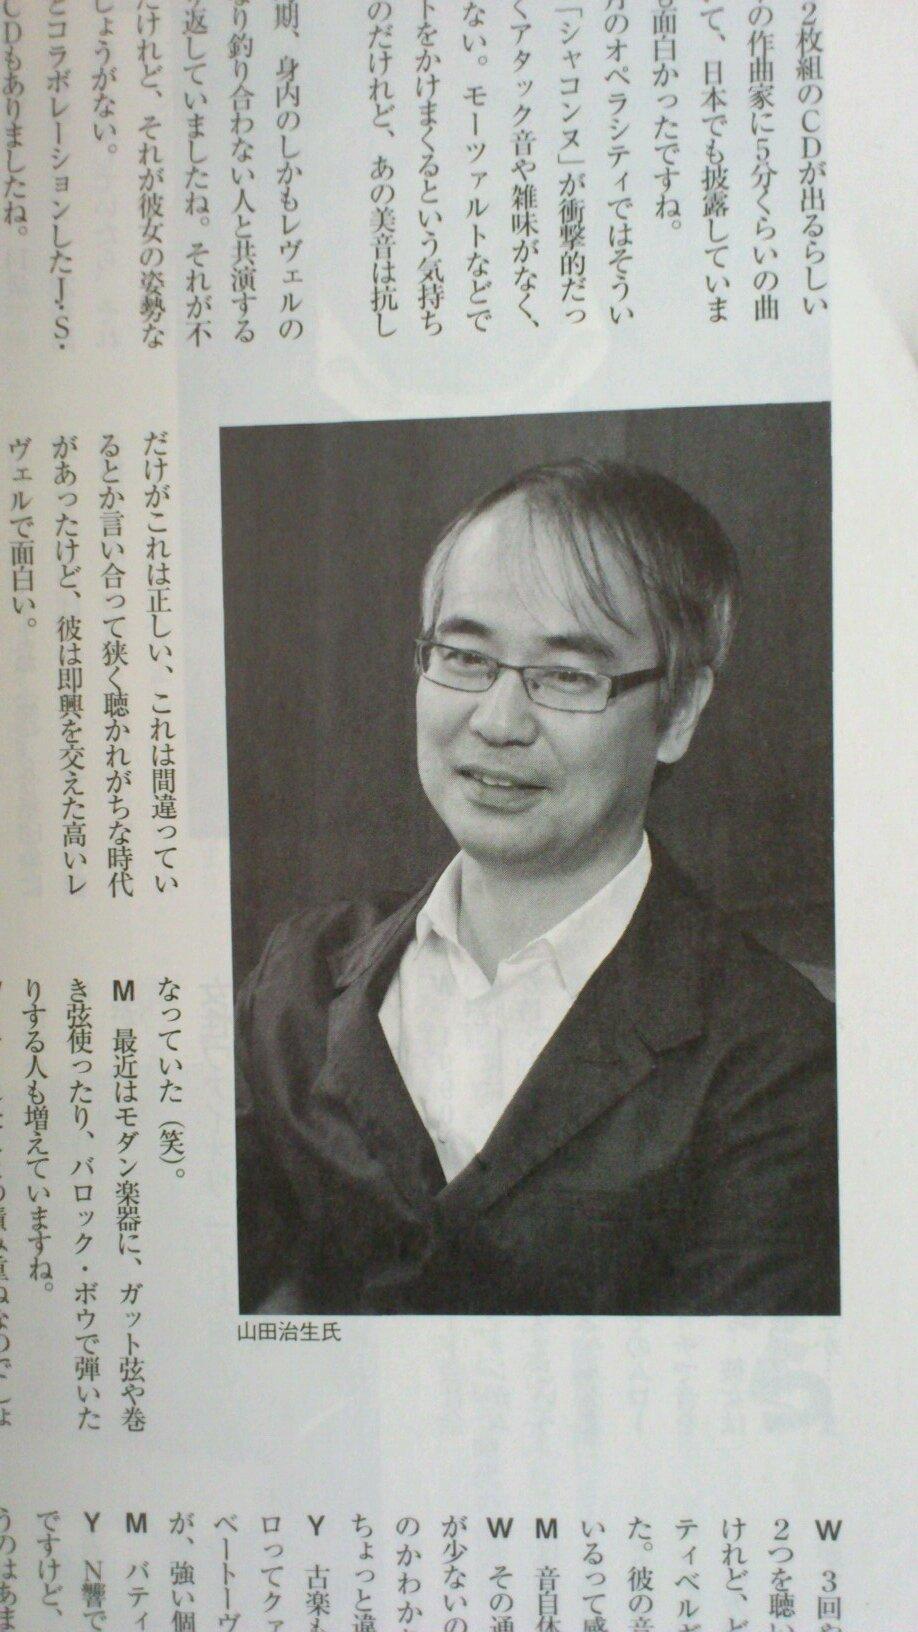 山田治生 Social Profile